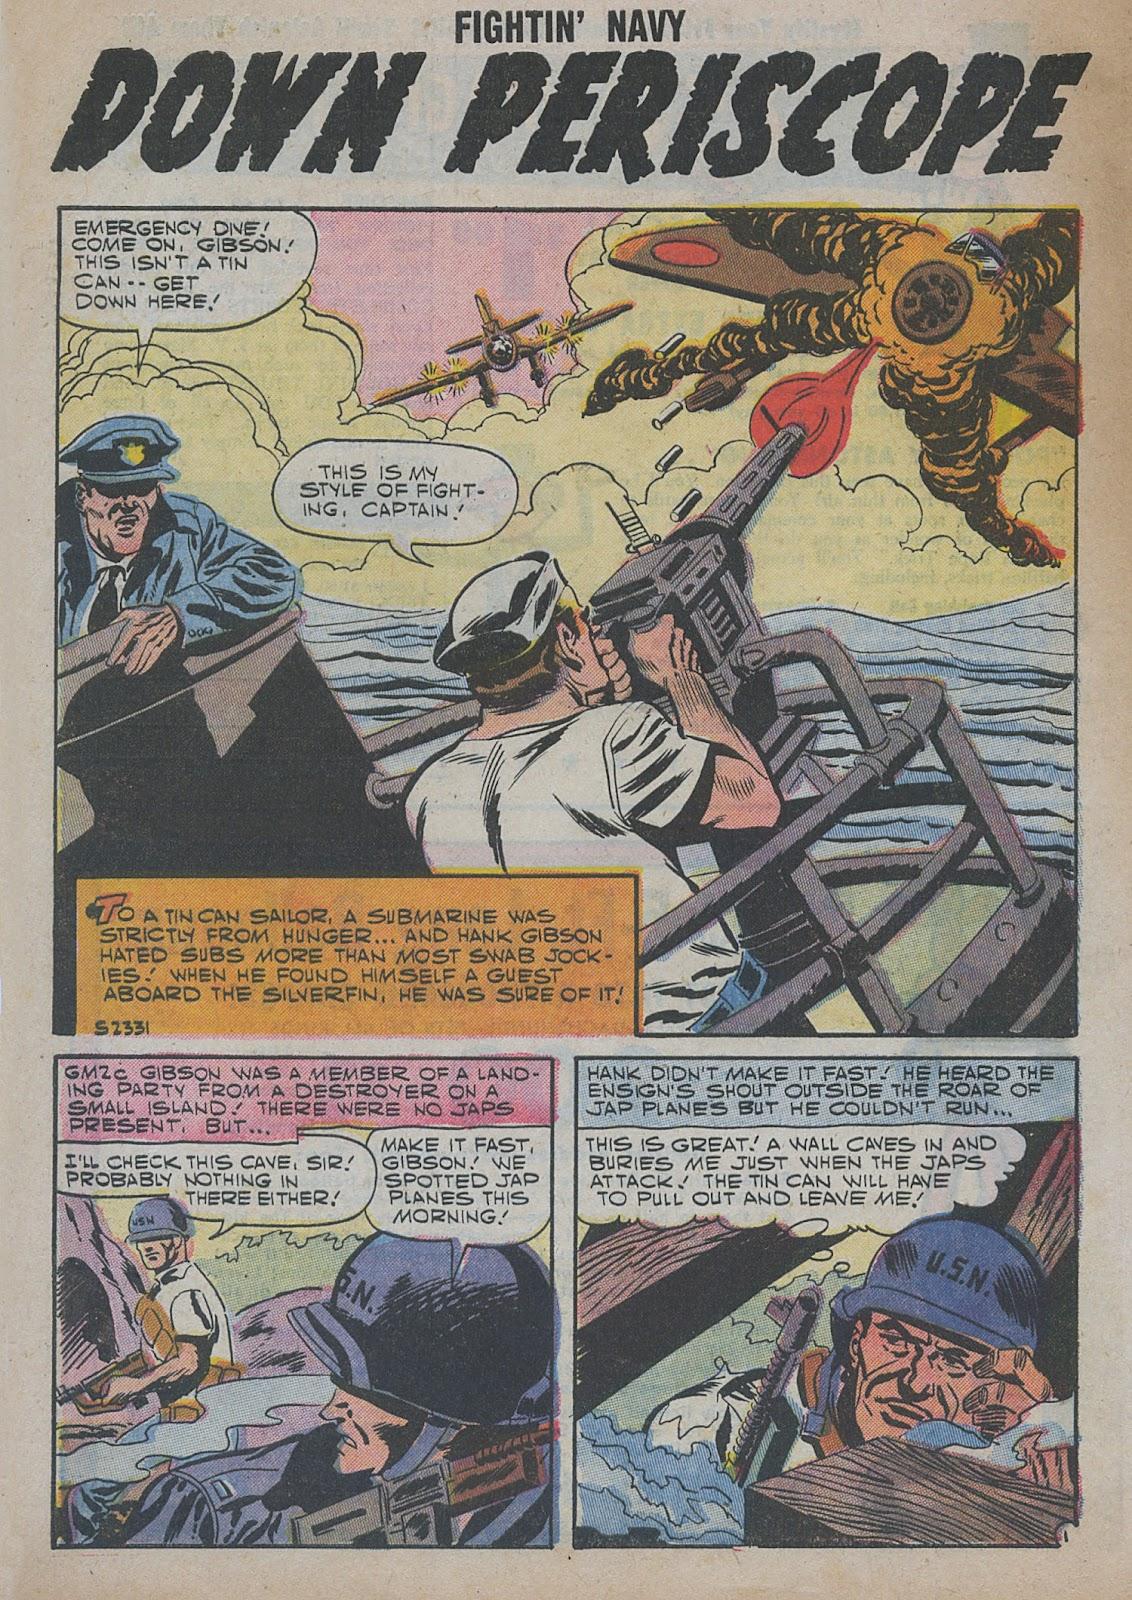 Read online Fightin' Navy comic -  Issue #82 - 54